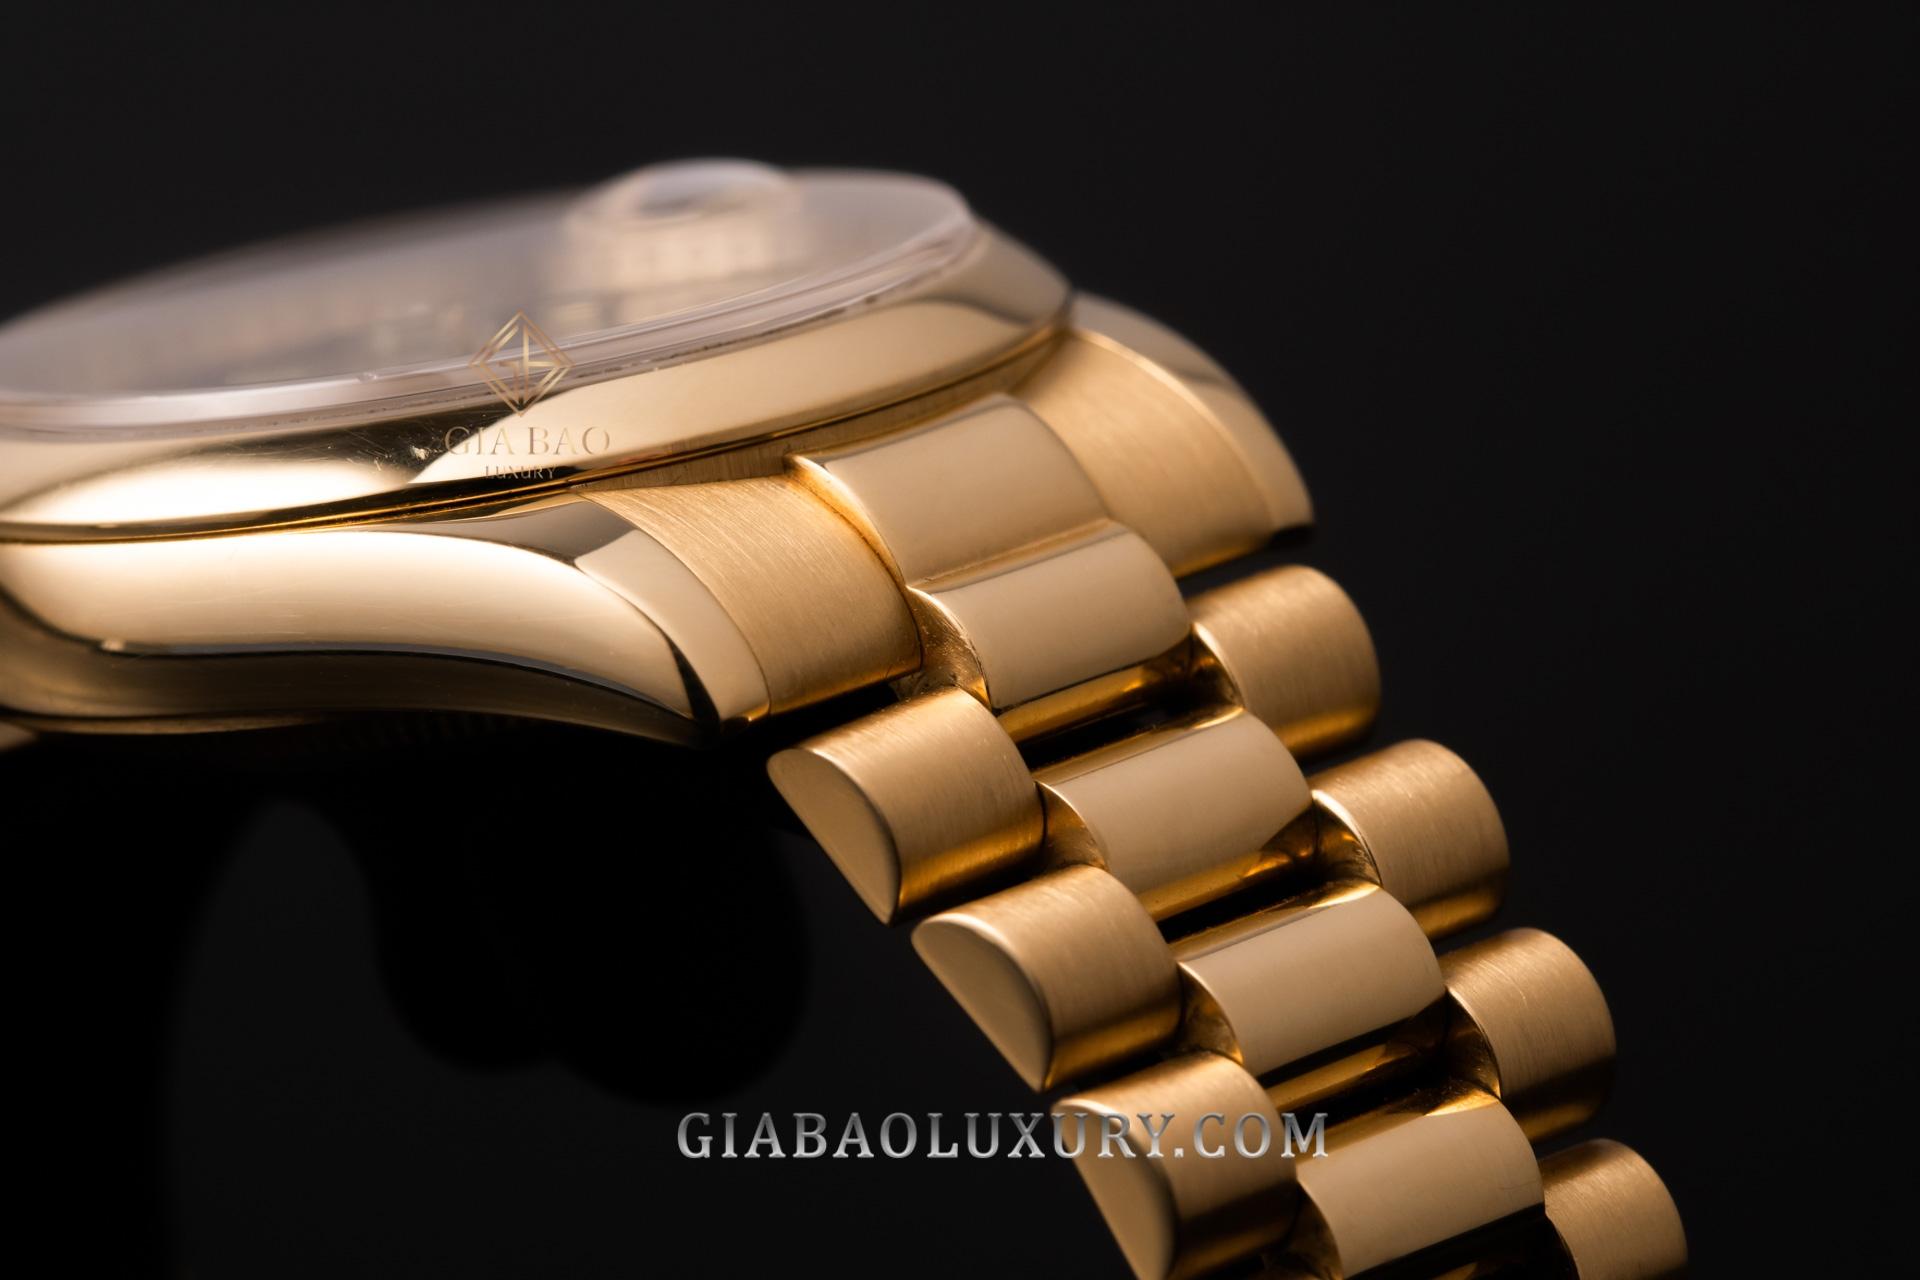 Đồng Hồ Rolex Day Date 36 118208 Mặt Số Đen Nạm Kim Cương